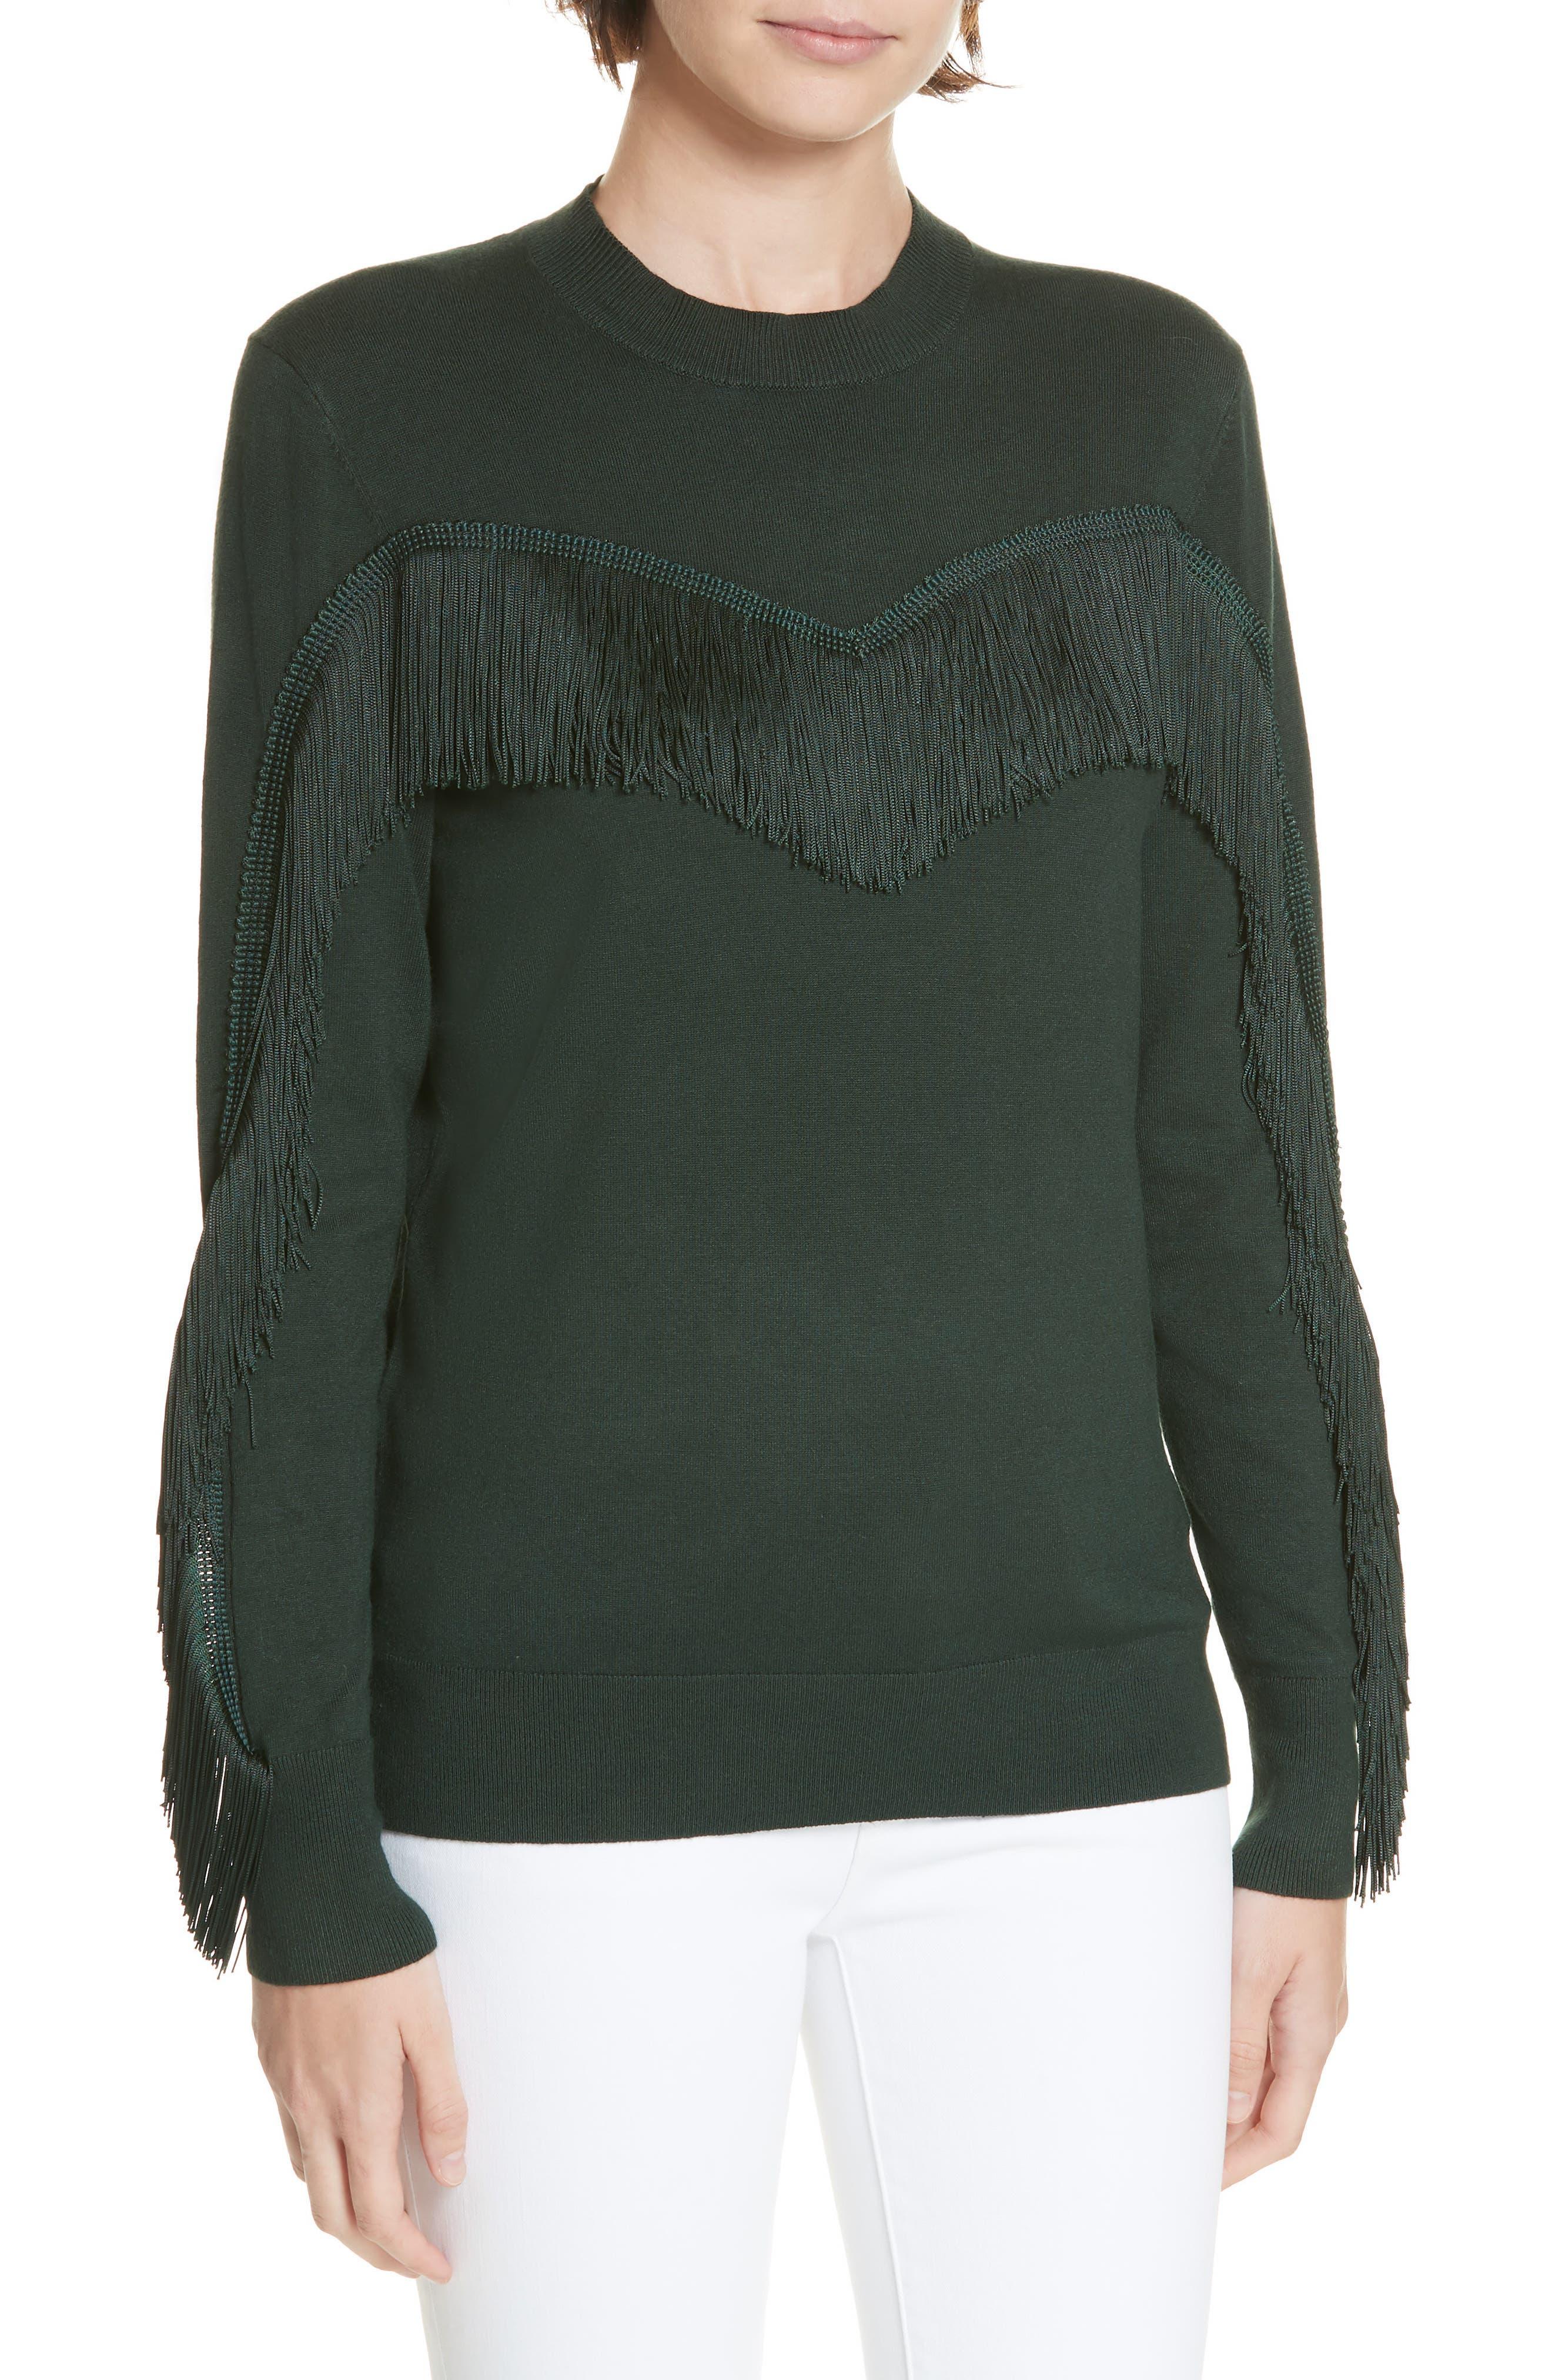 Aniebal Fringe Trim Sweater,                             Main thumbnail 1, color,                             DARK GREEN